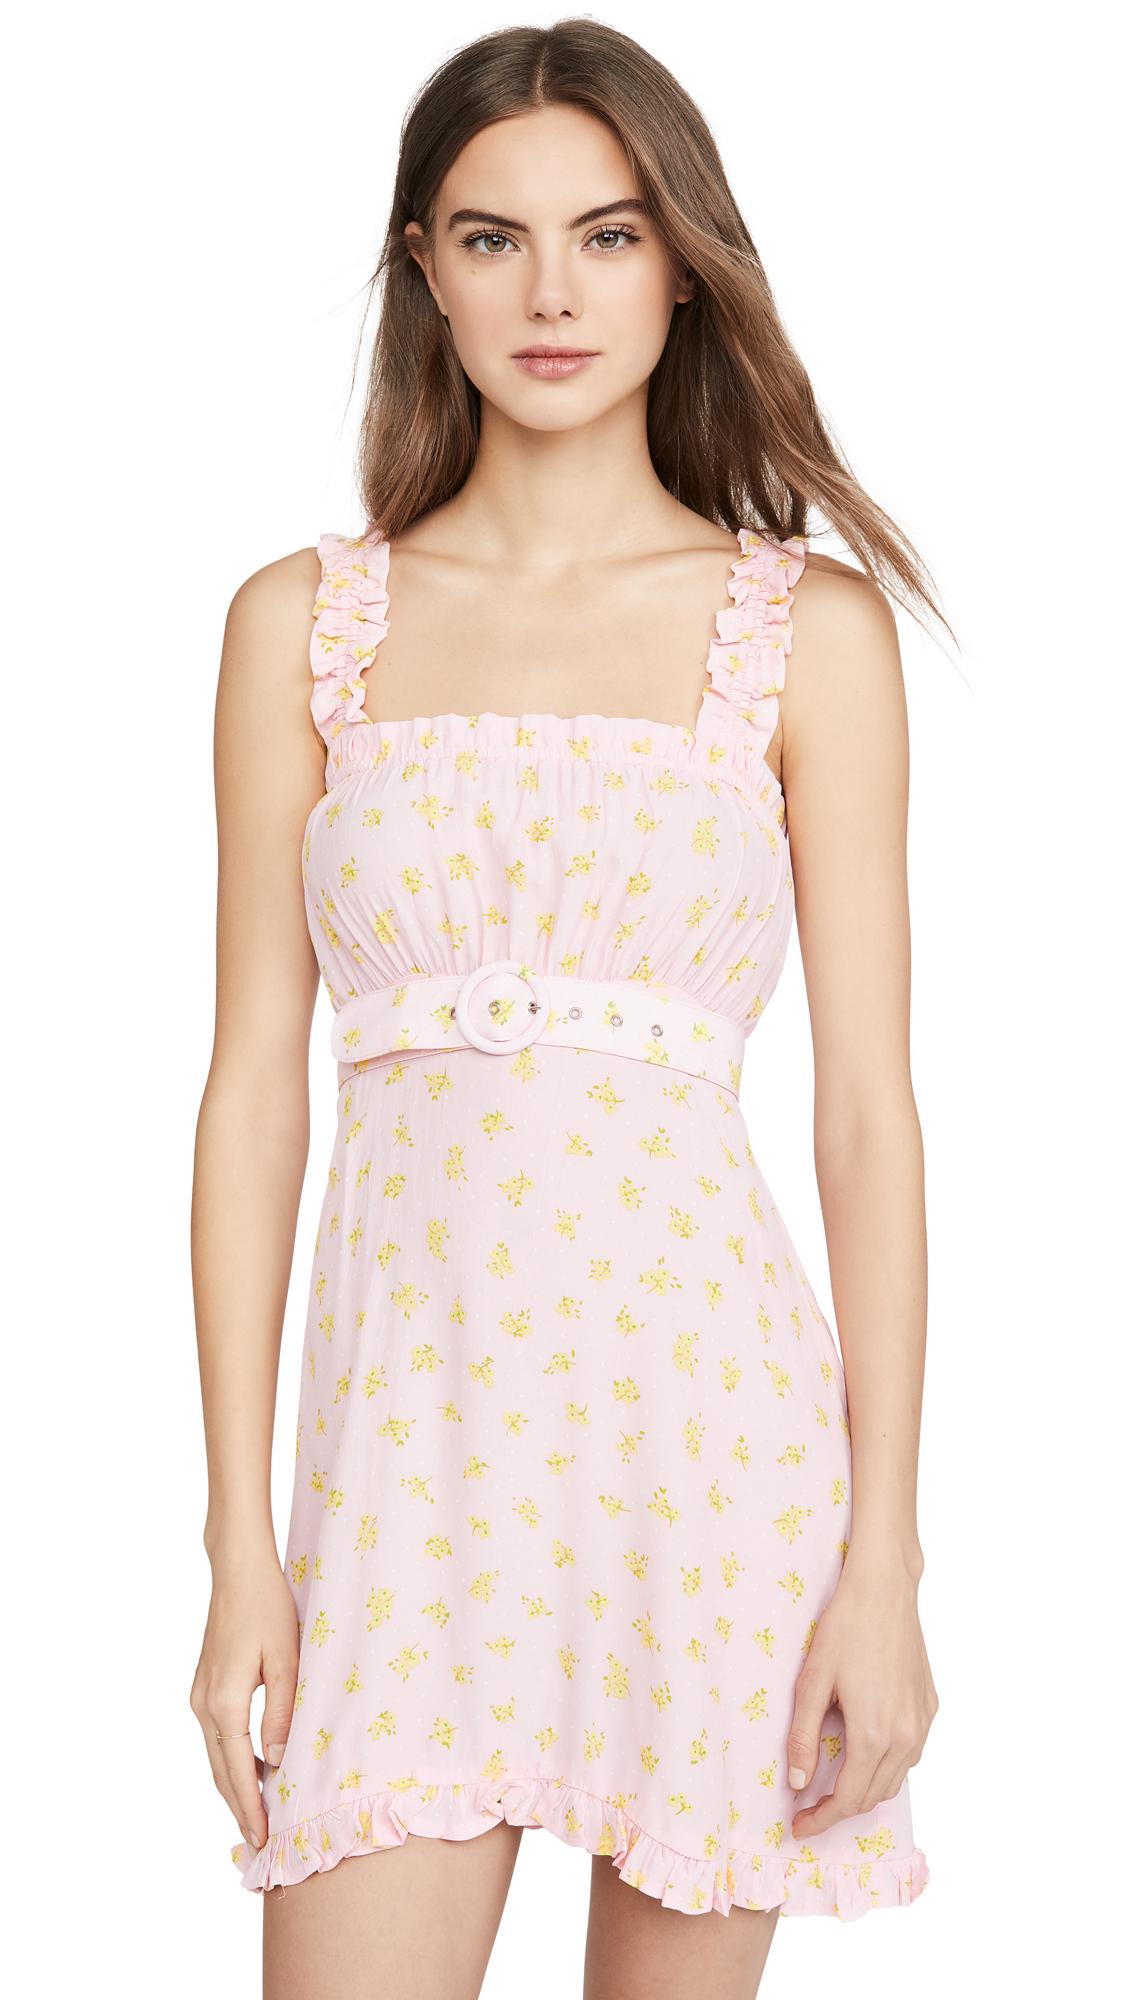 FAITHFULL THE BRAND Mid Summer Mini Dress - 60% Off Sale